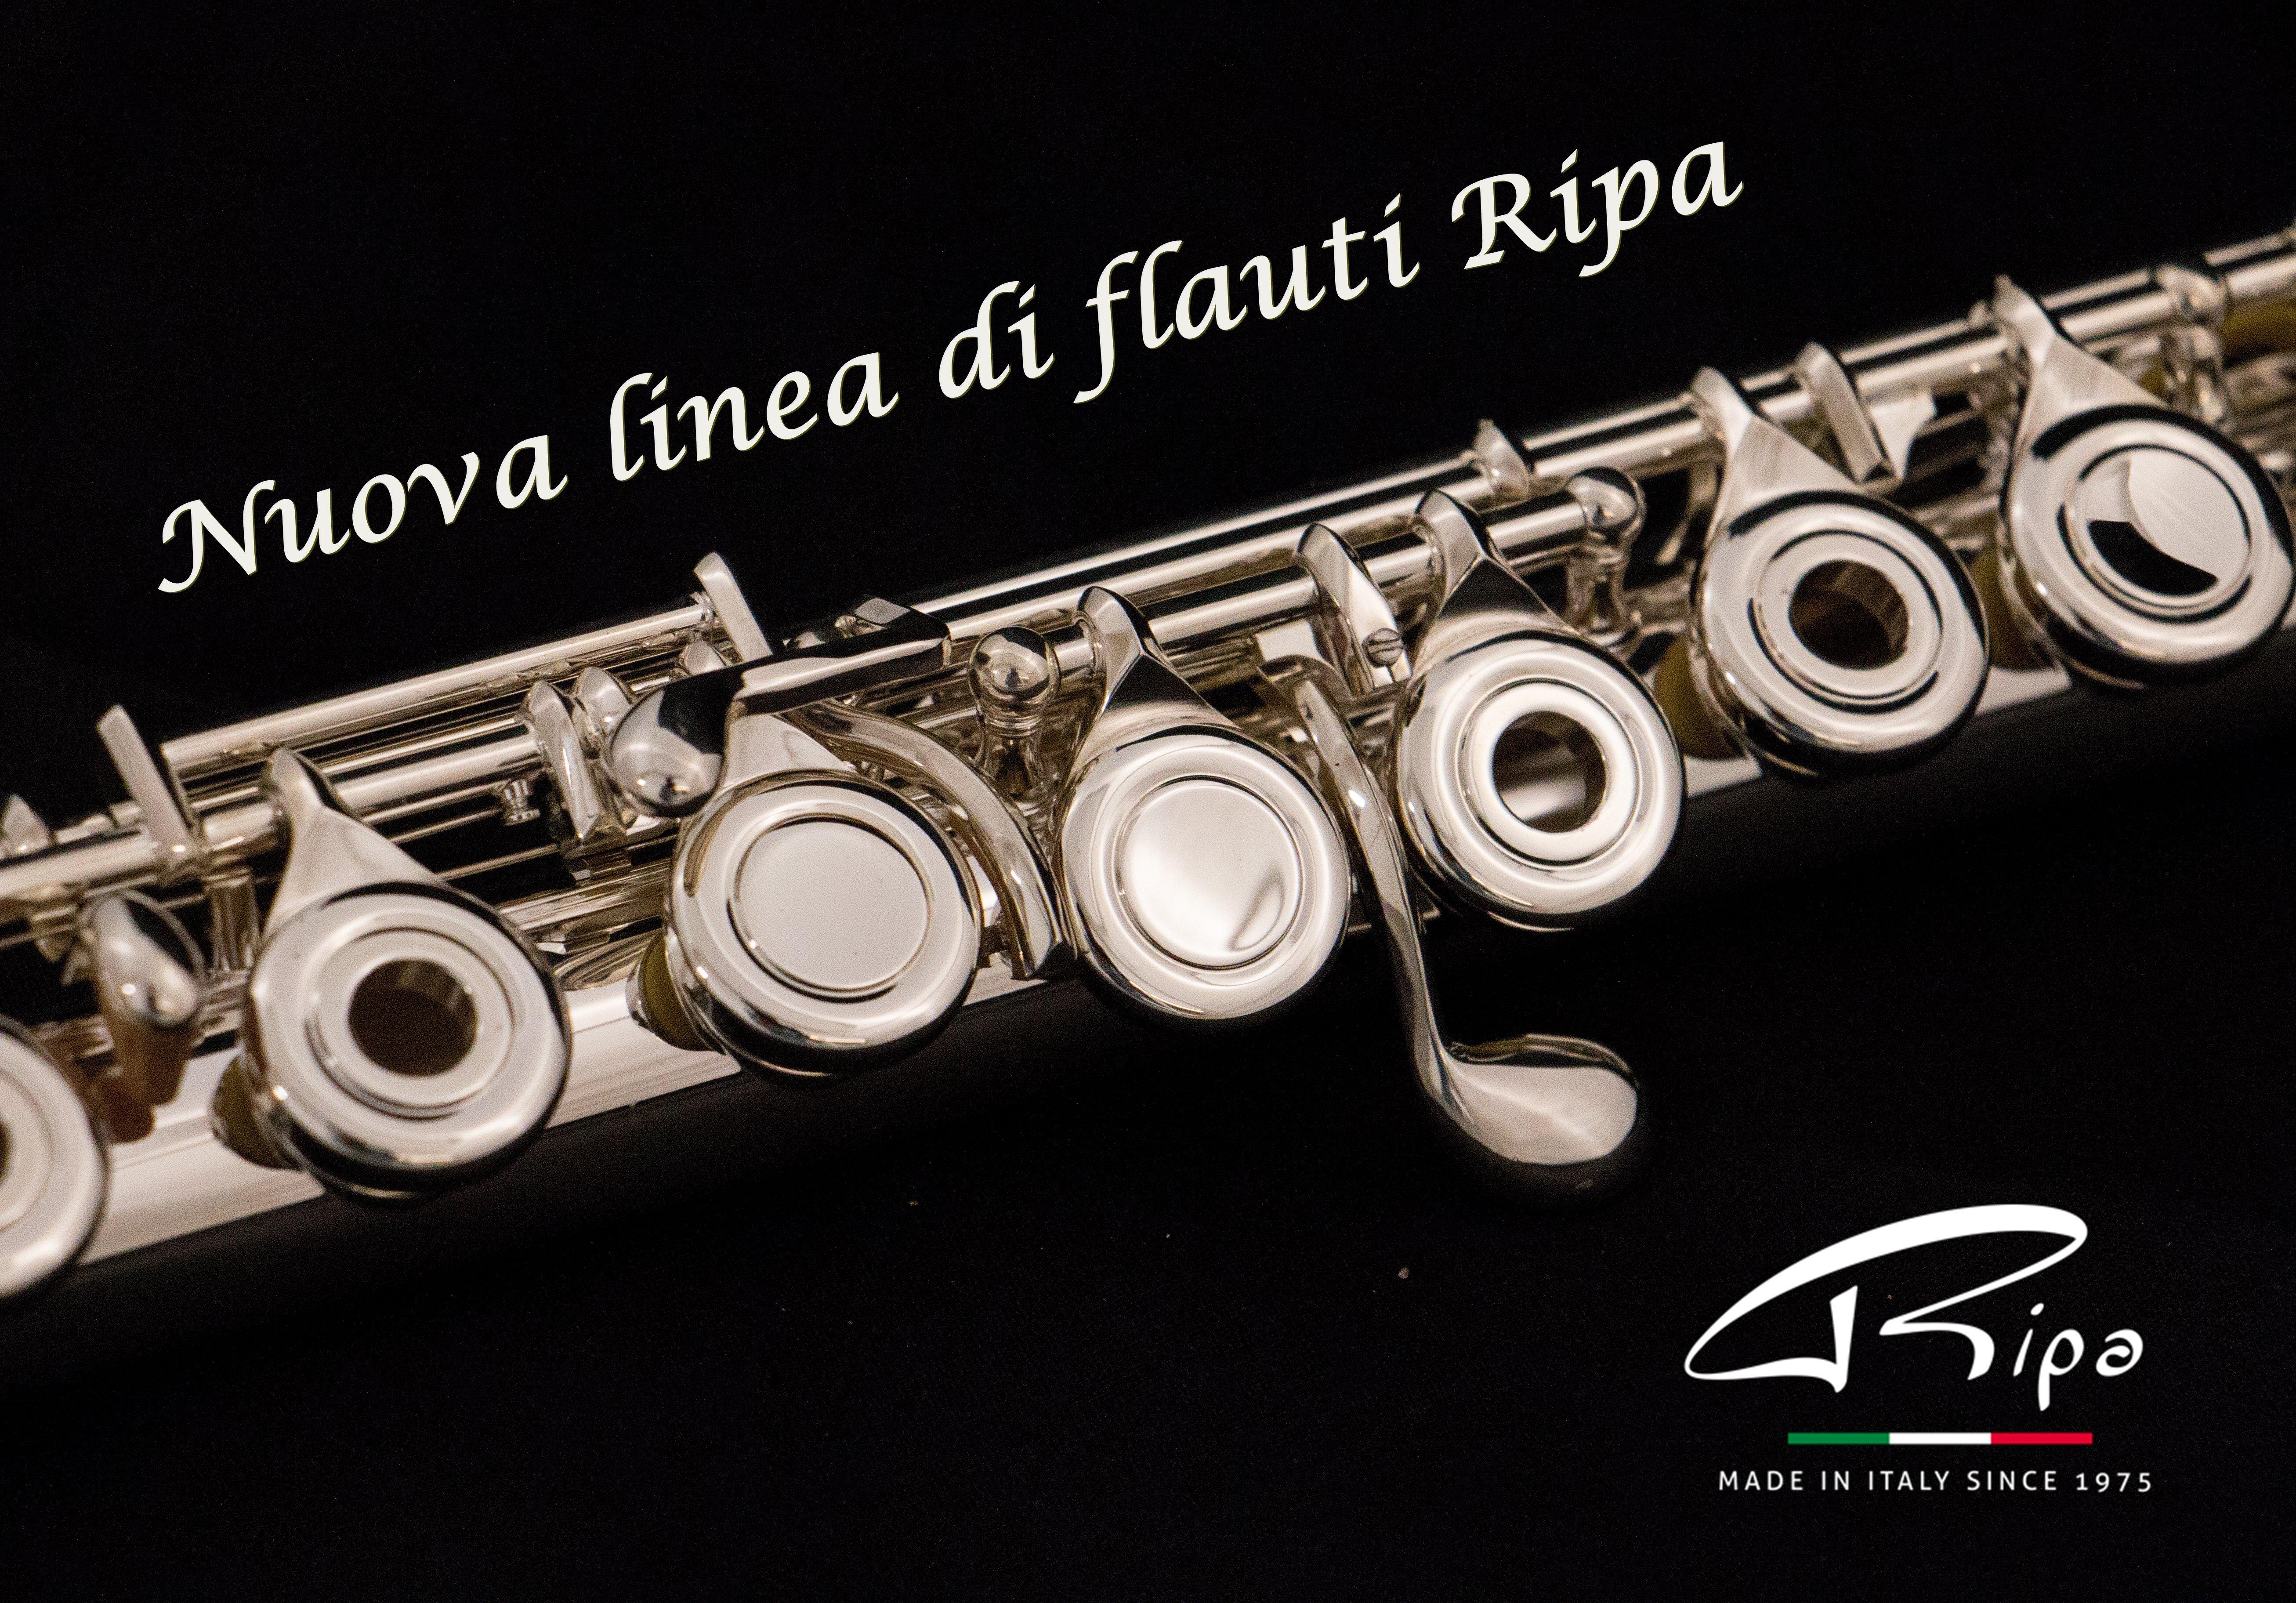 NUOVA LINEA FLAUTI RIPA MUSIC